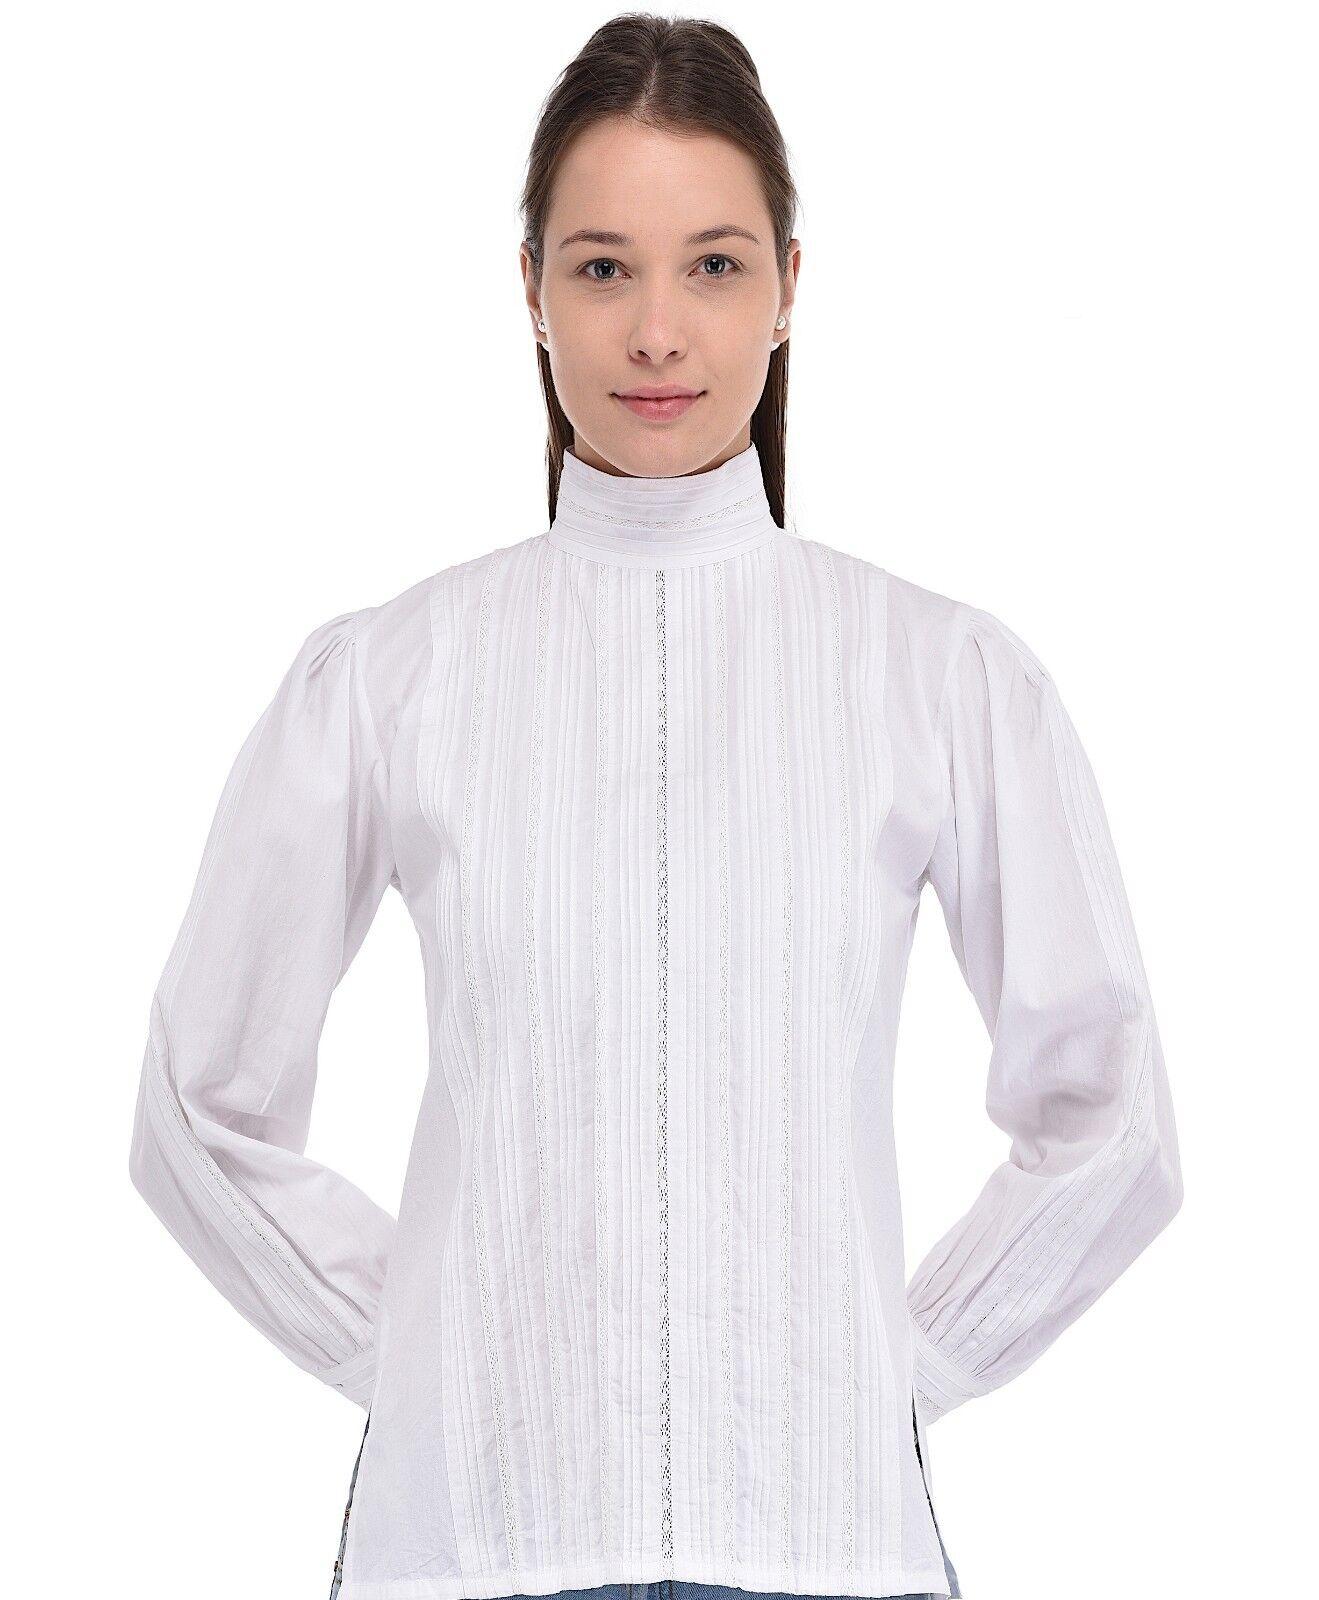 Weiß Victorian Edwardian Long Long Long Sleeve Blouse   Cotton Lane | Moderate Kosten  40306e